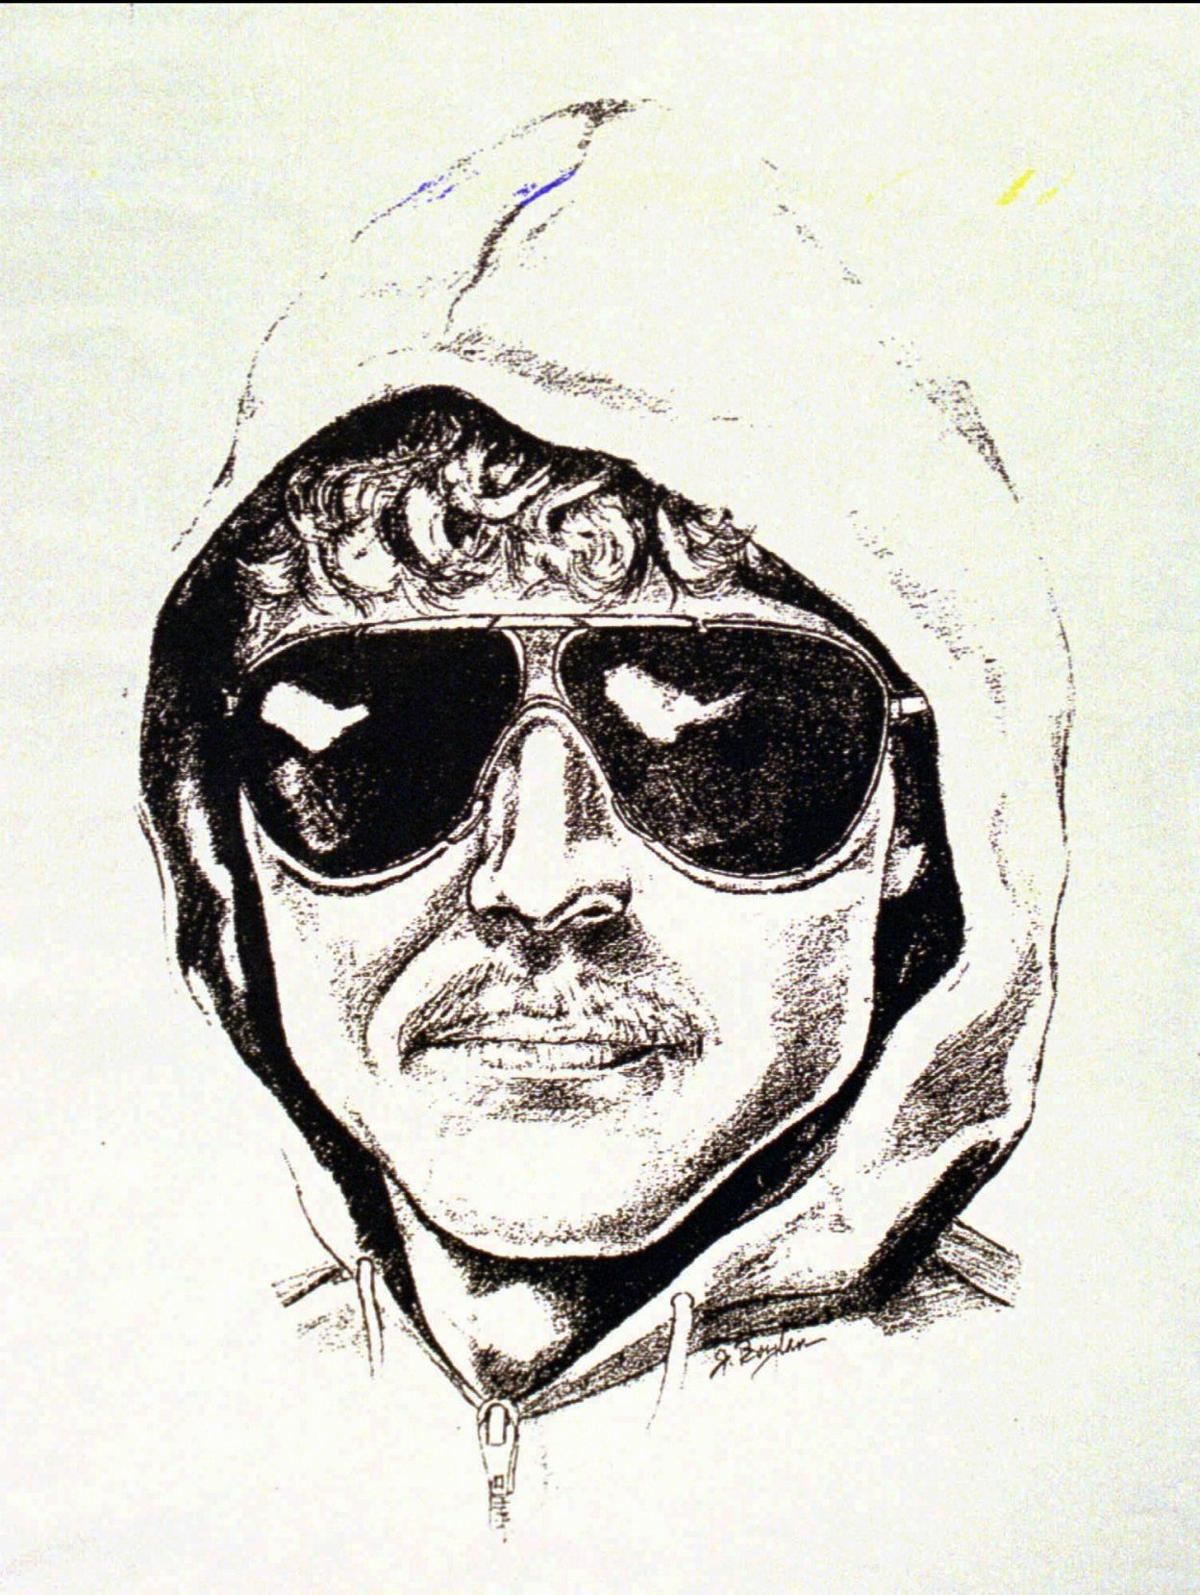 1995: The Unabomber (IR copy)